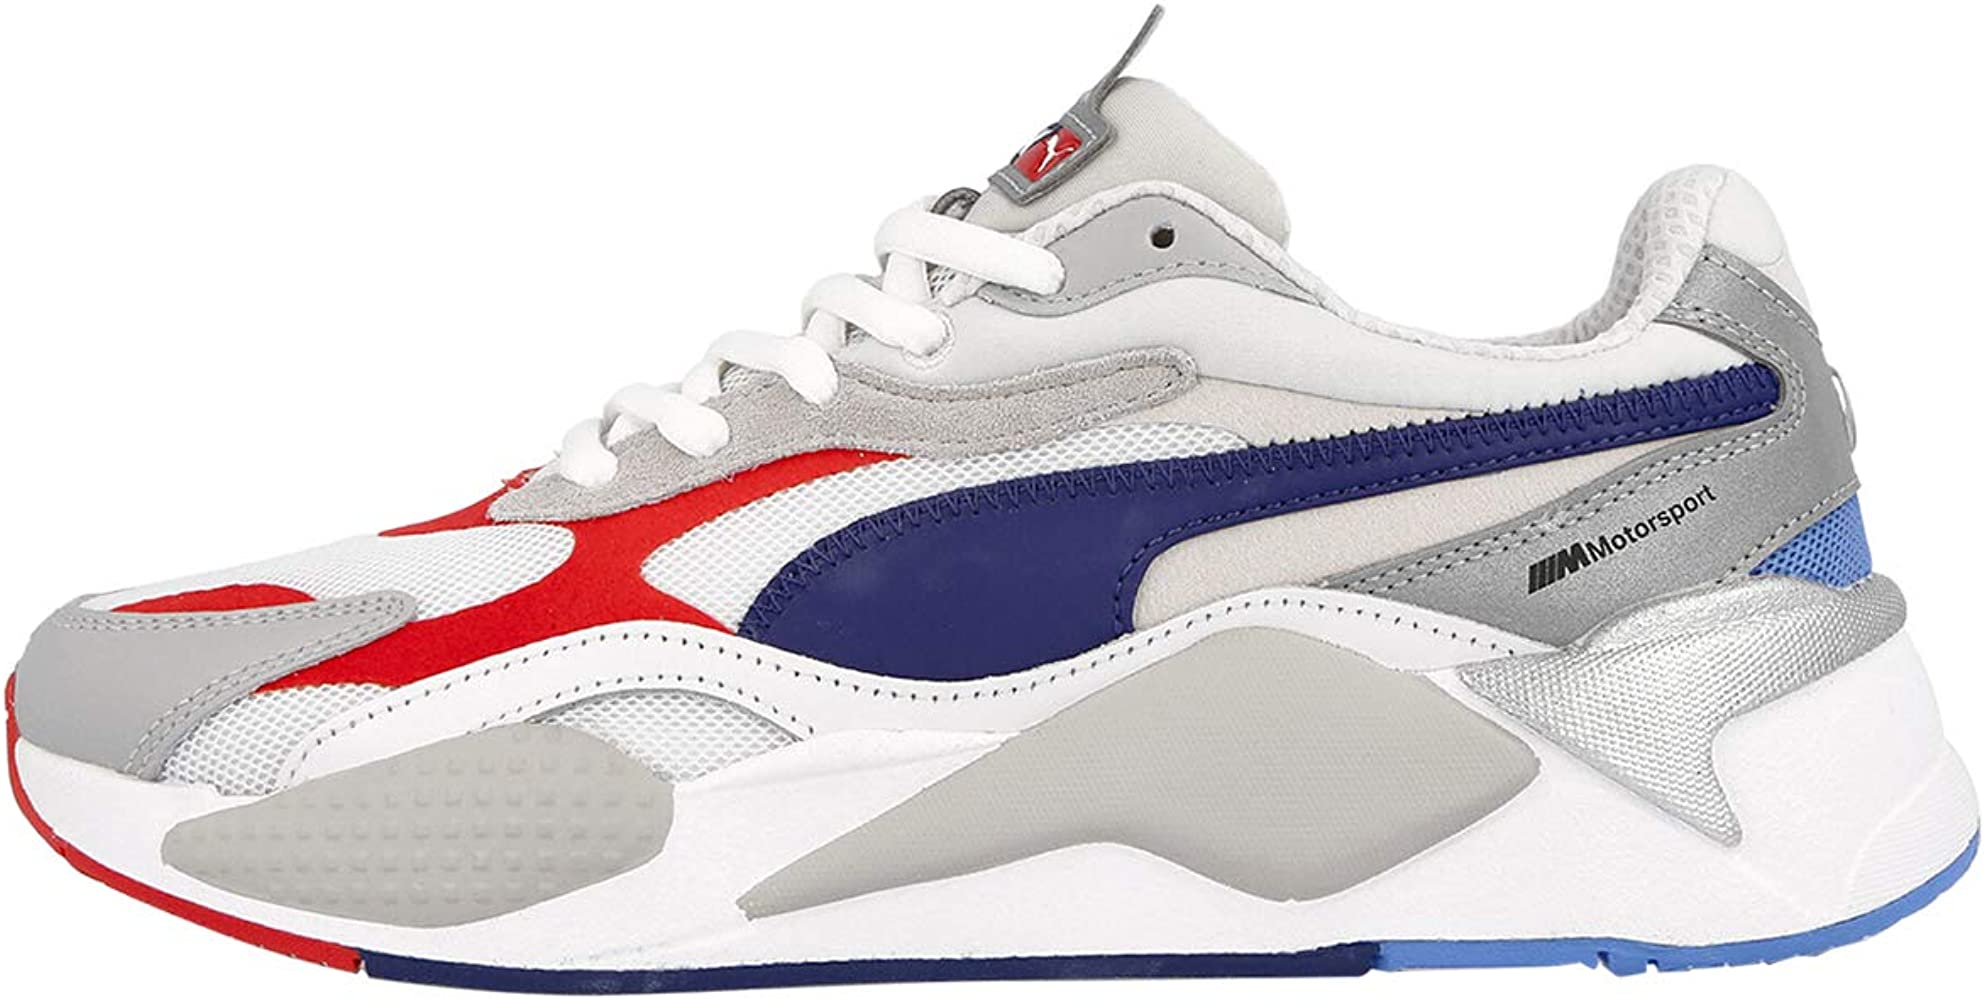 Puma - Mens BMW MMS Rs-Cube Shoes